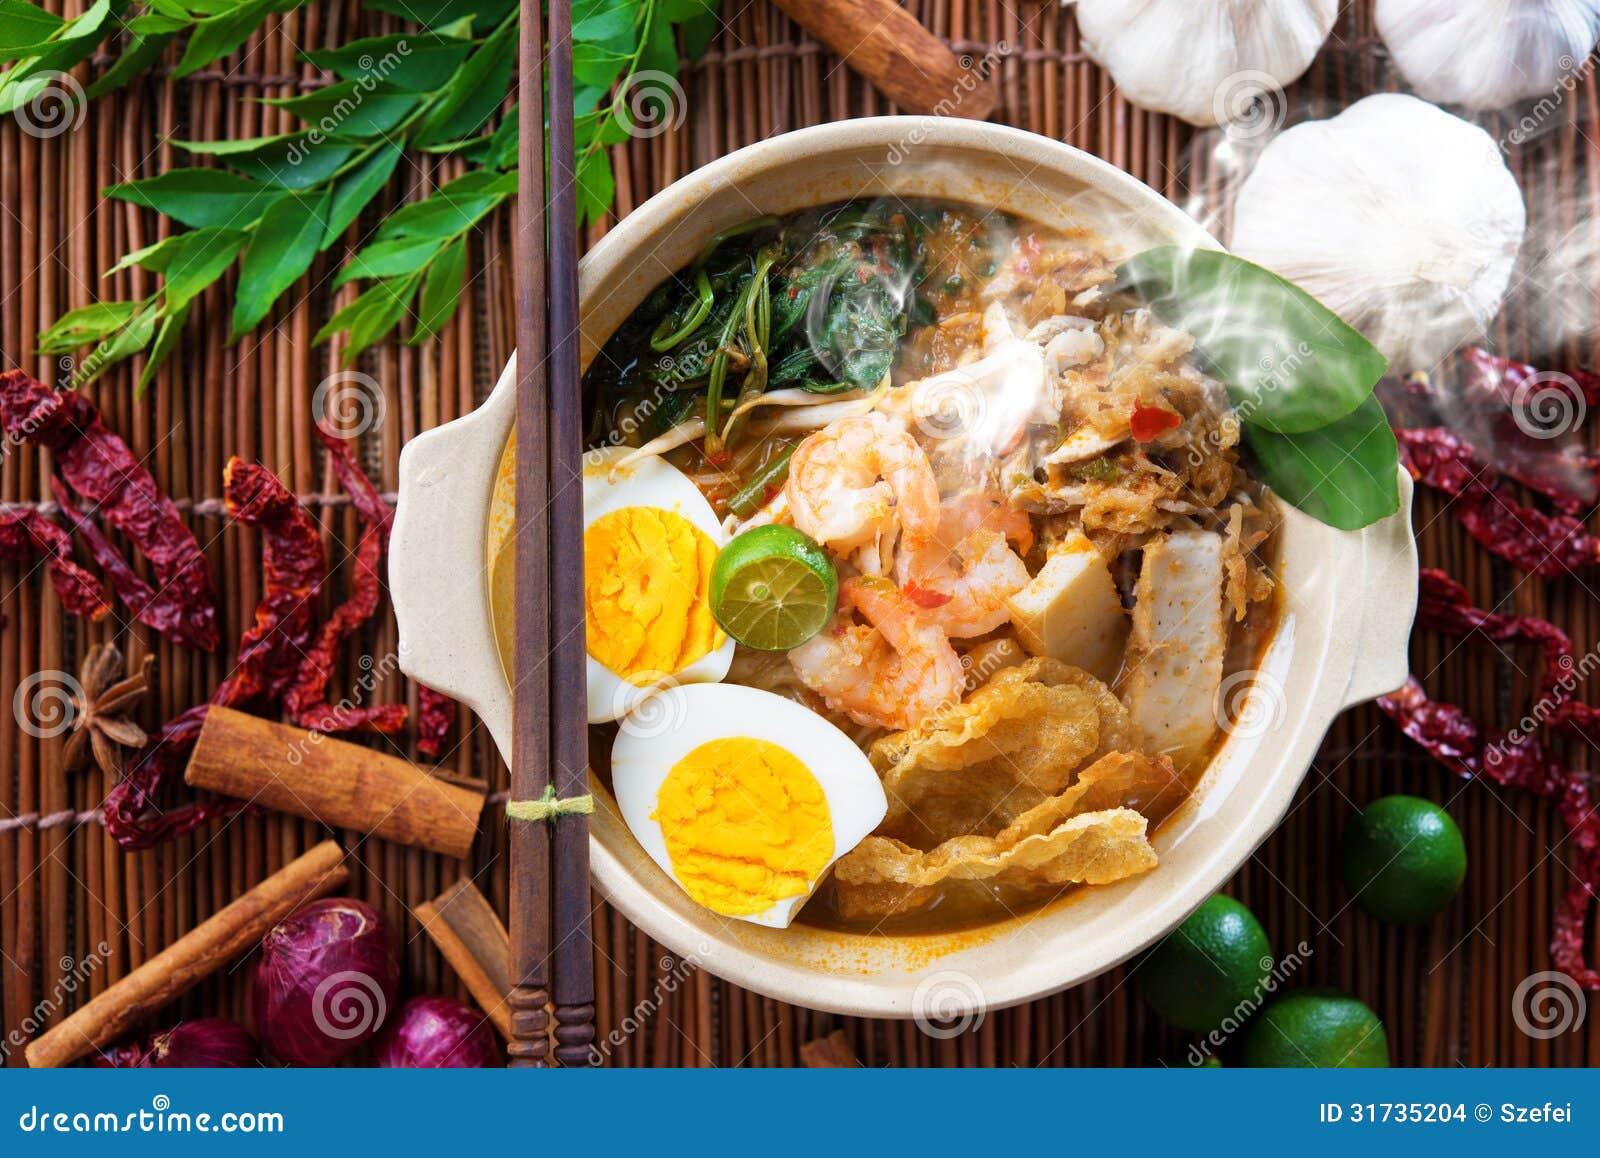 Malaysian Food Stock Images Image 31735204